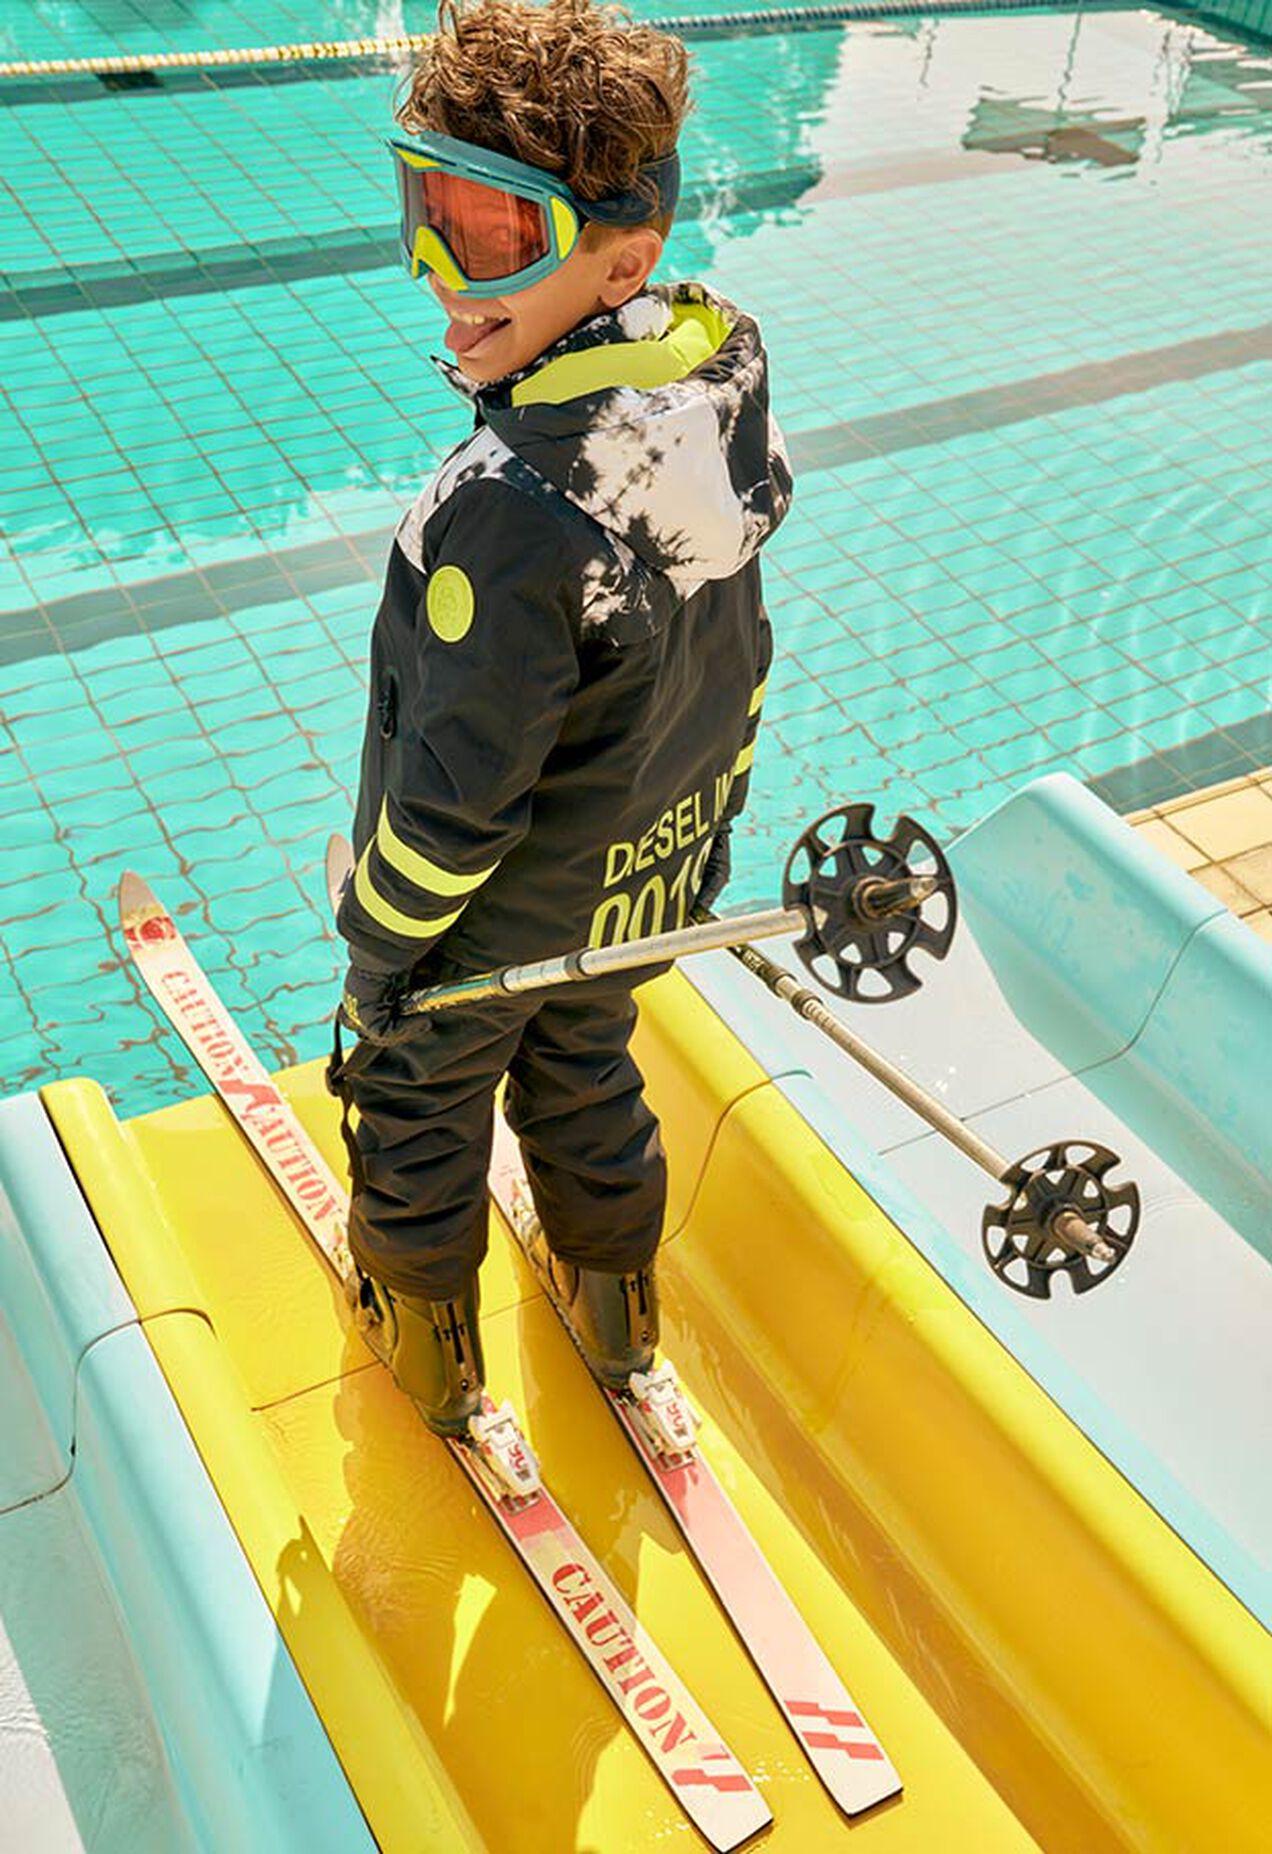 JODEL-SKI, Noir - Equipement de ski